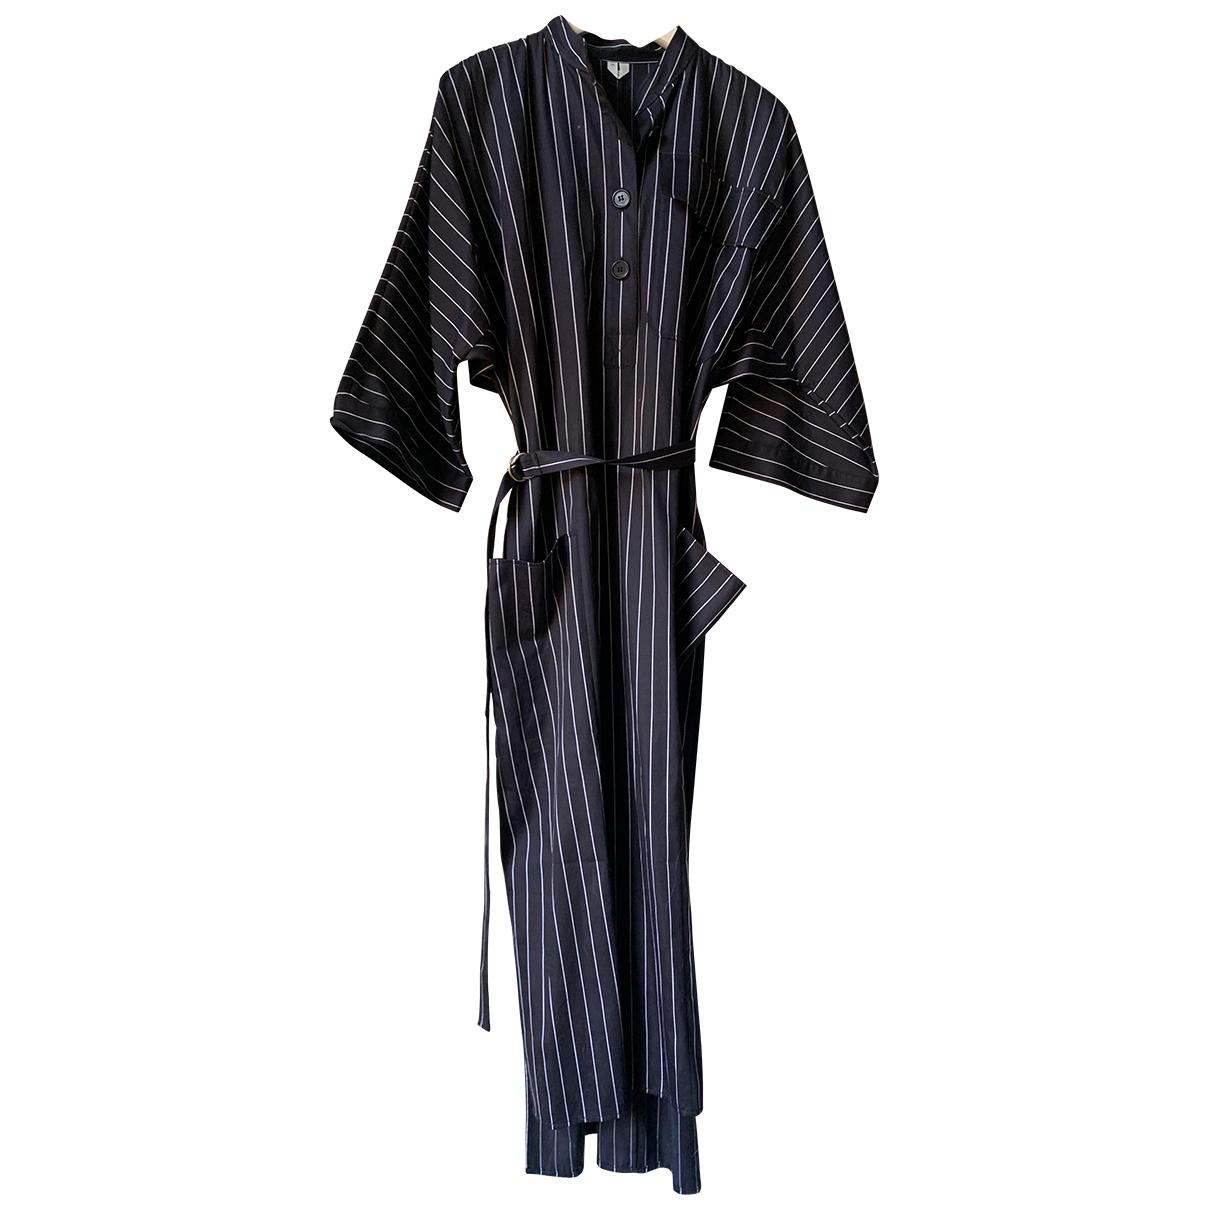 Arket N Navy Cotton dress for Women 34 FR